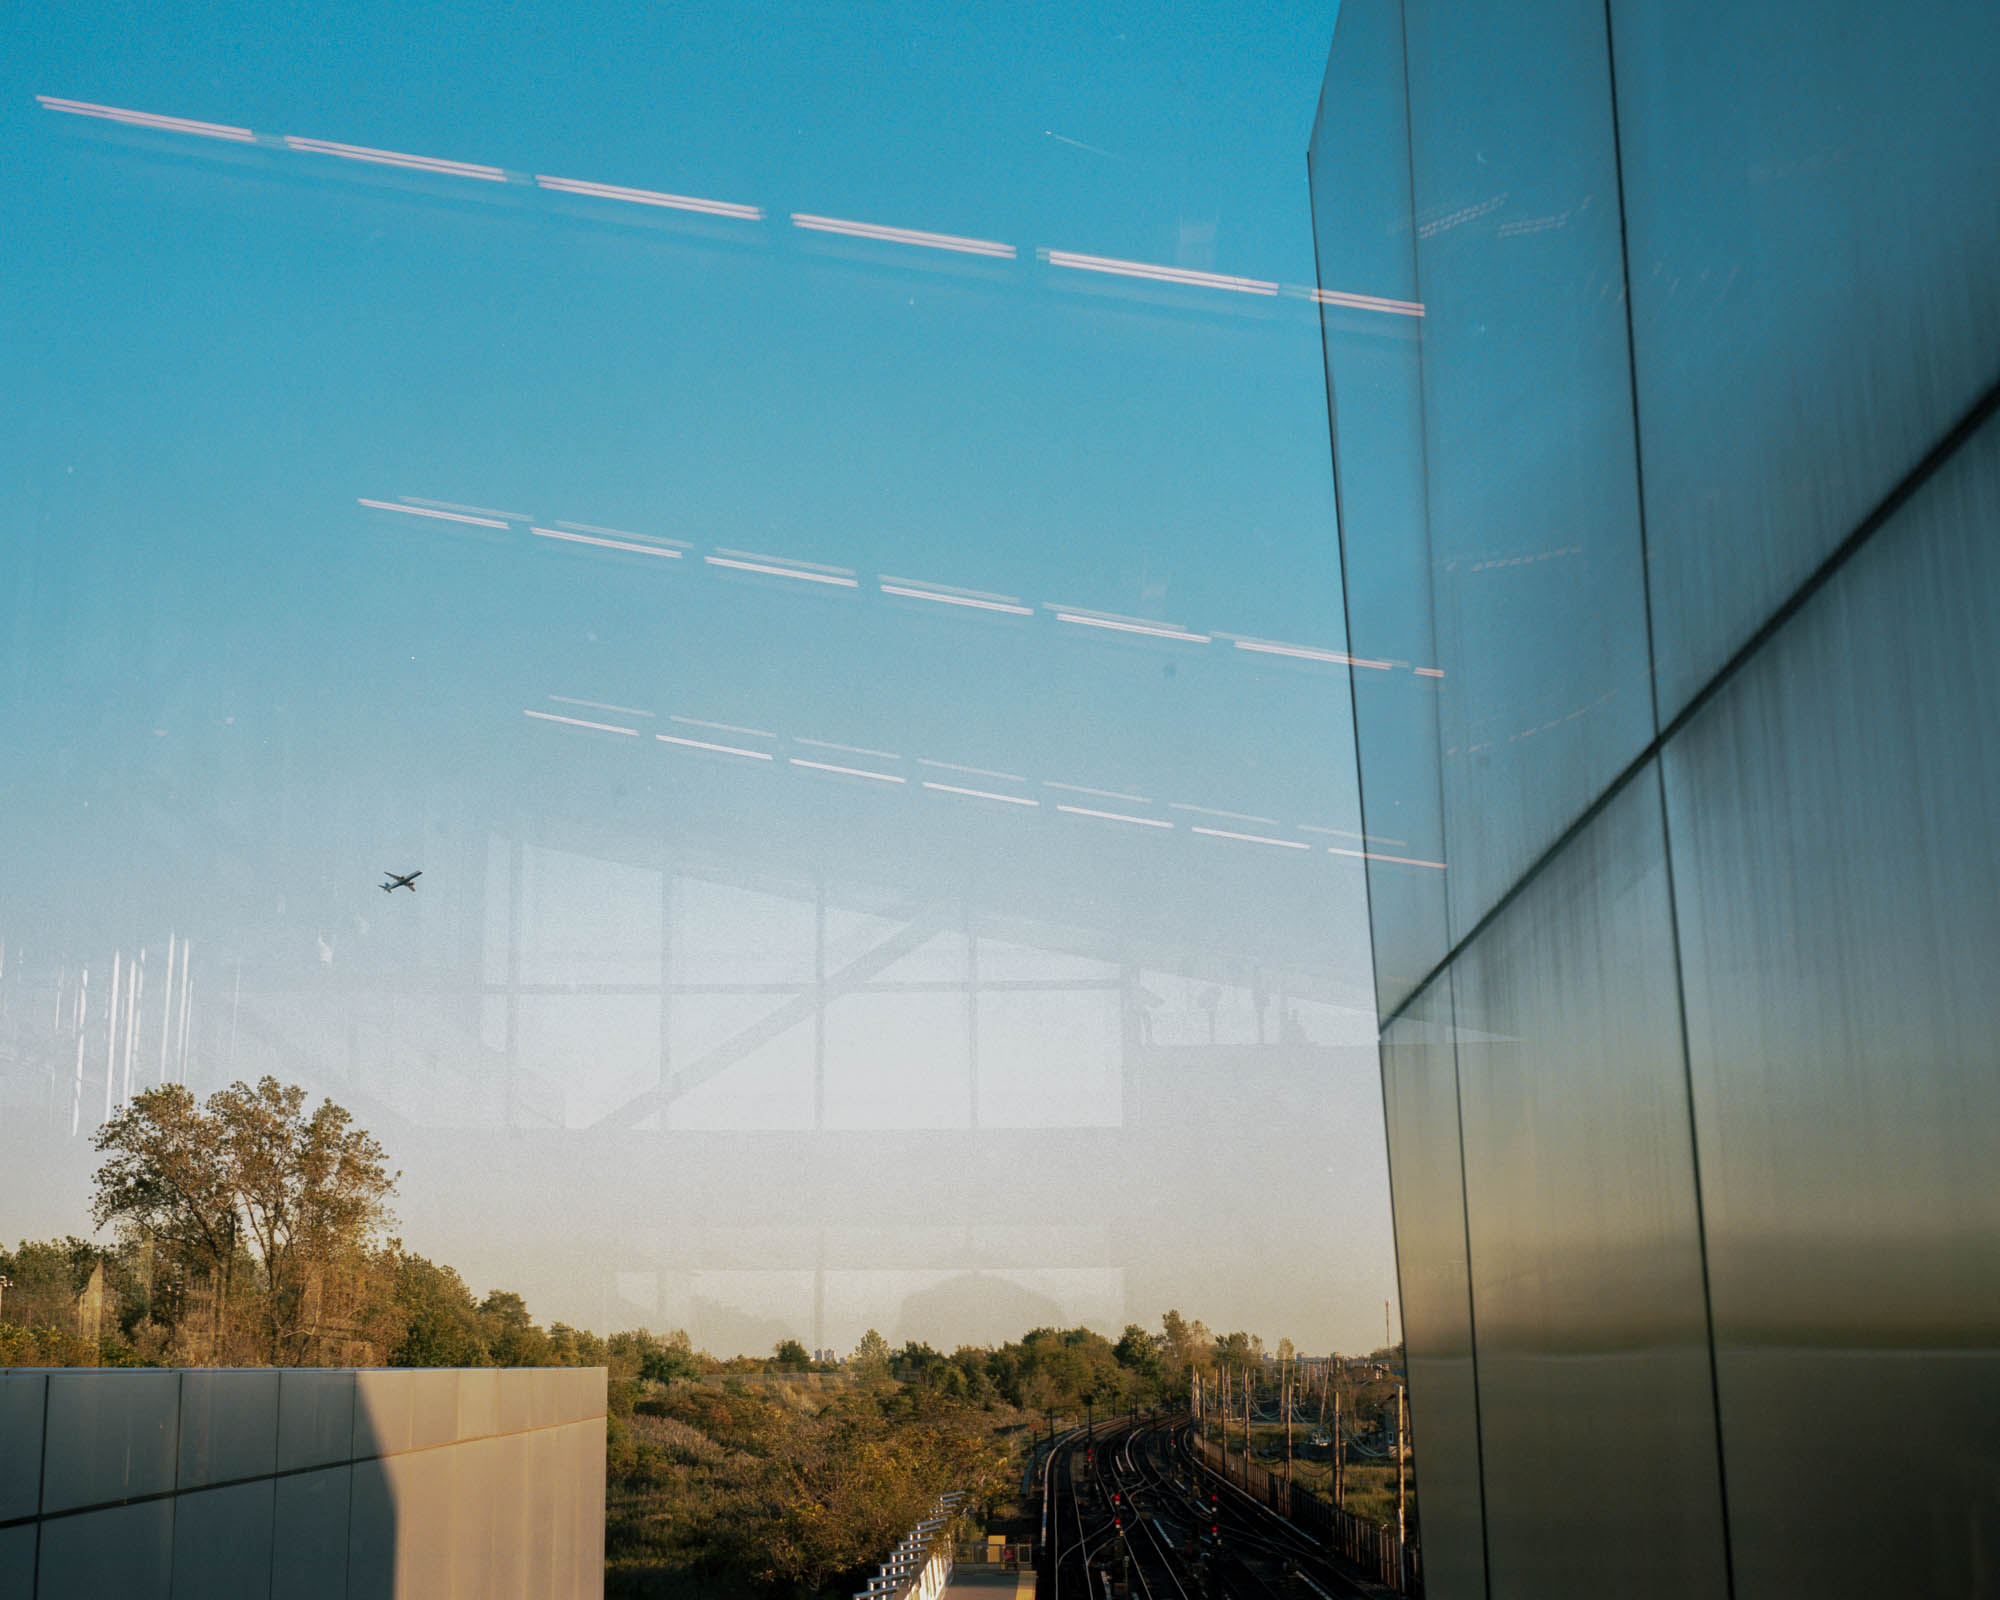 skyway-37.jpg